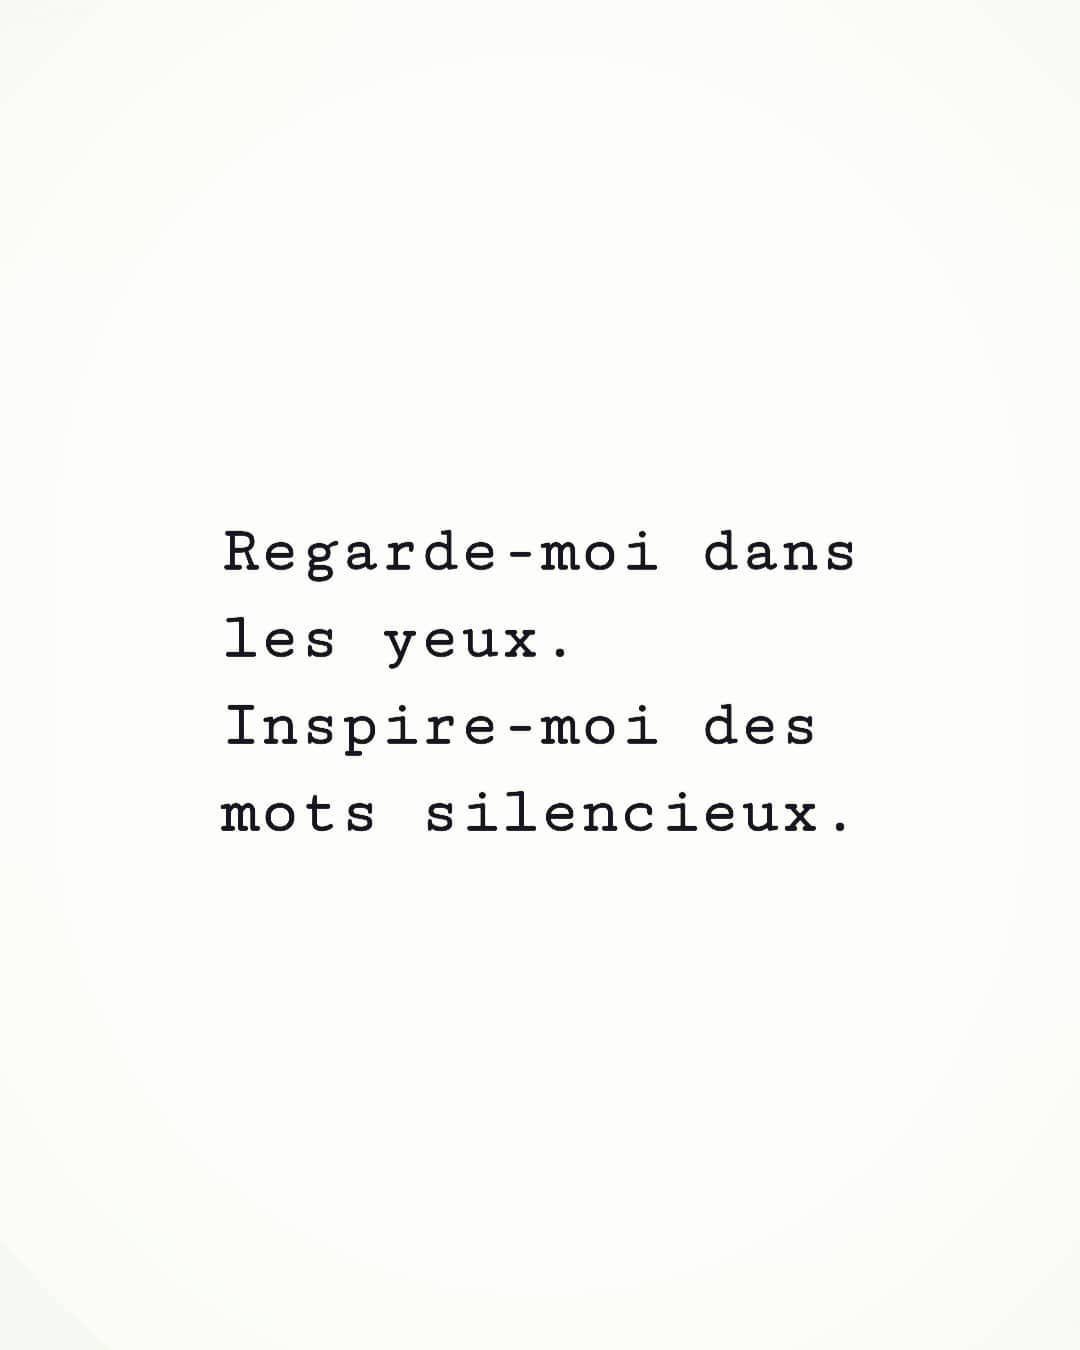 flirten auf französisch sätze leihmutter single mann